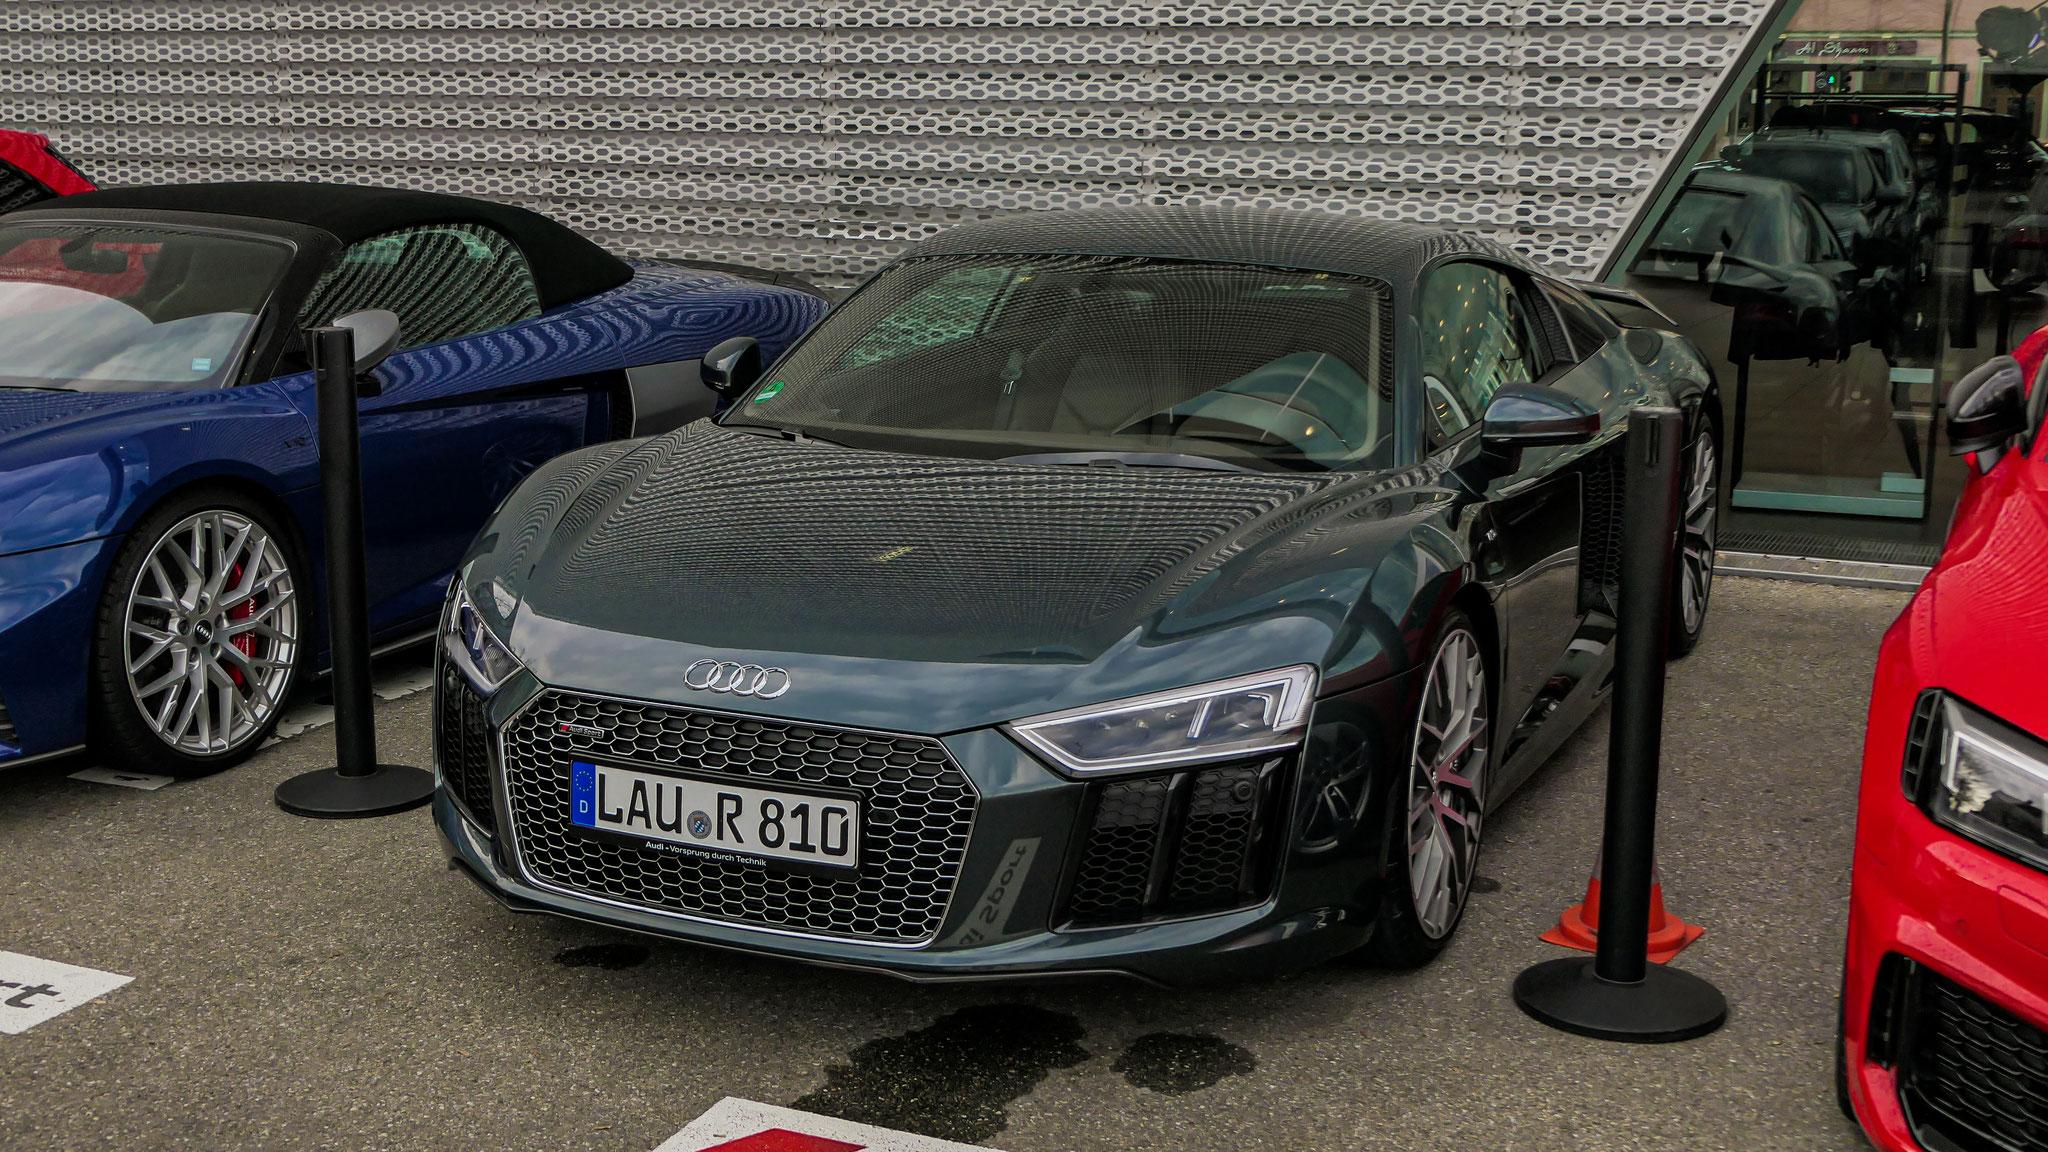 Audi R8 V10 - LAU-R-810